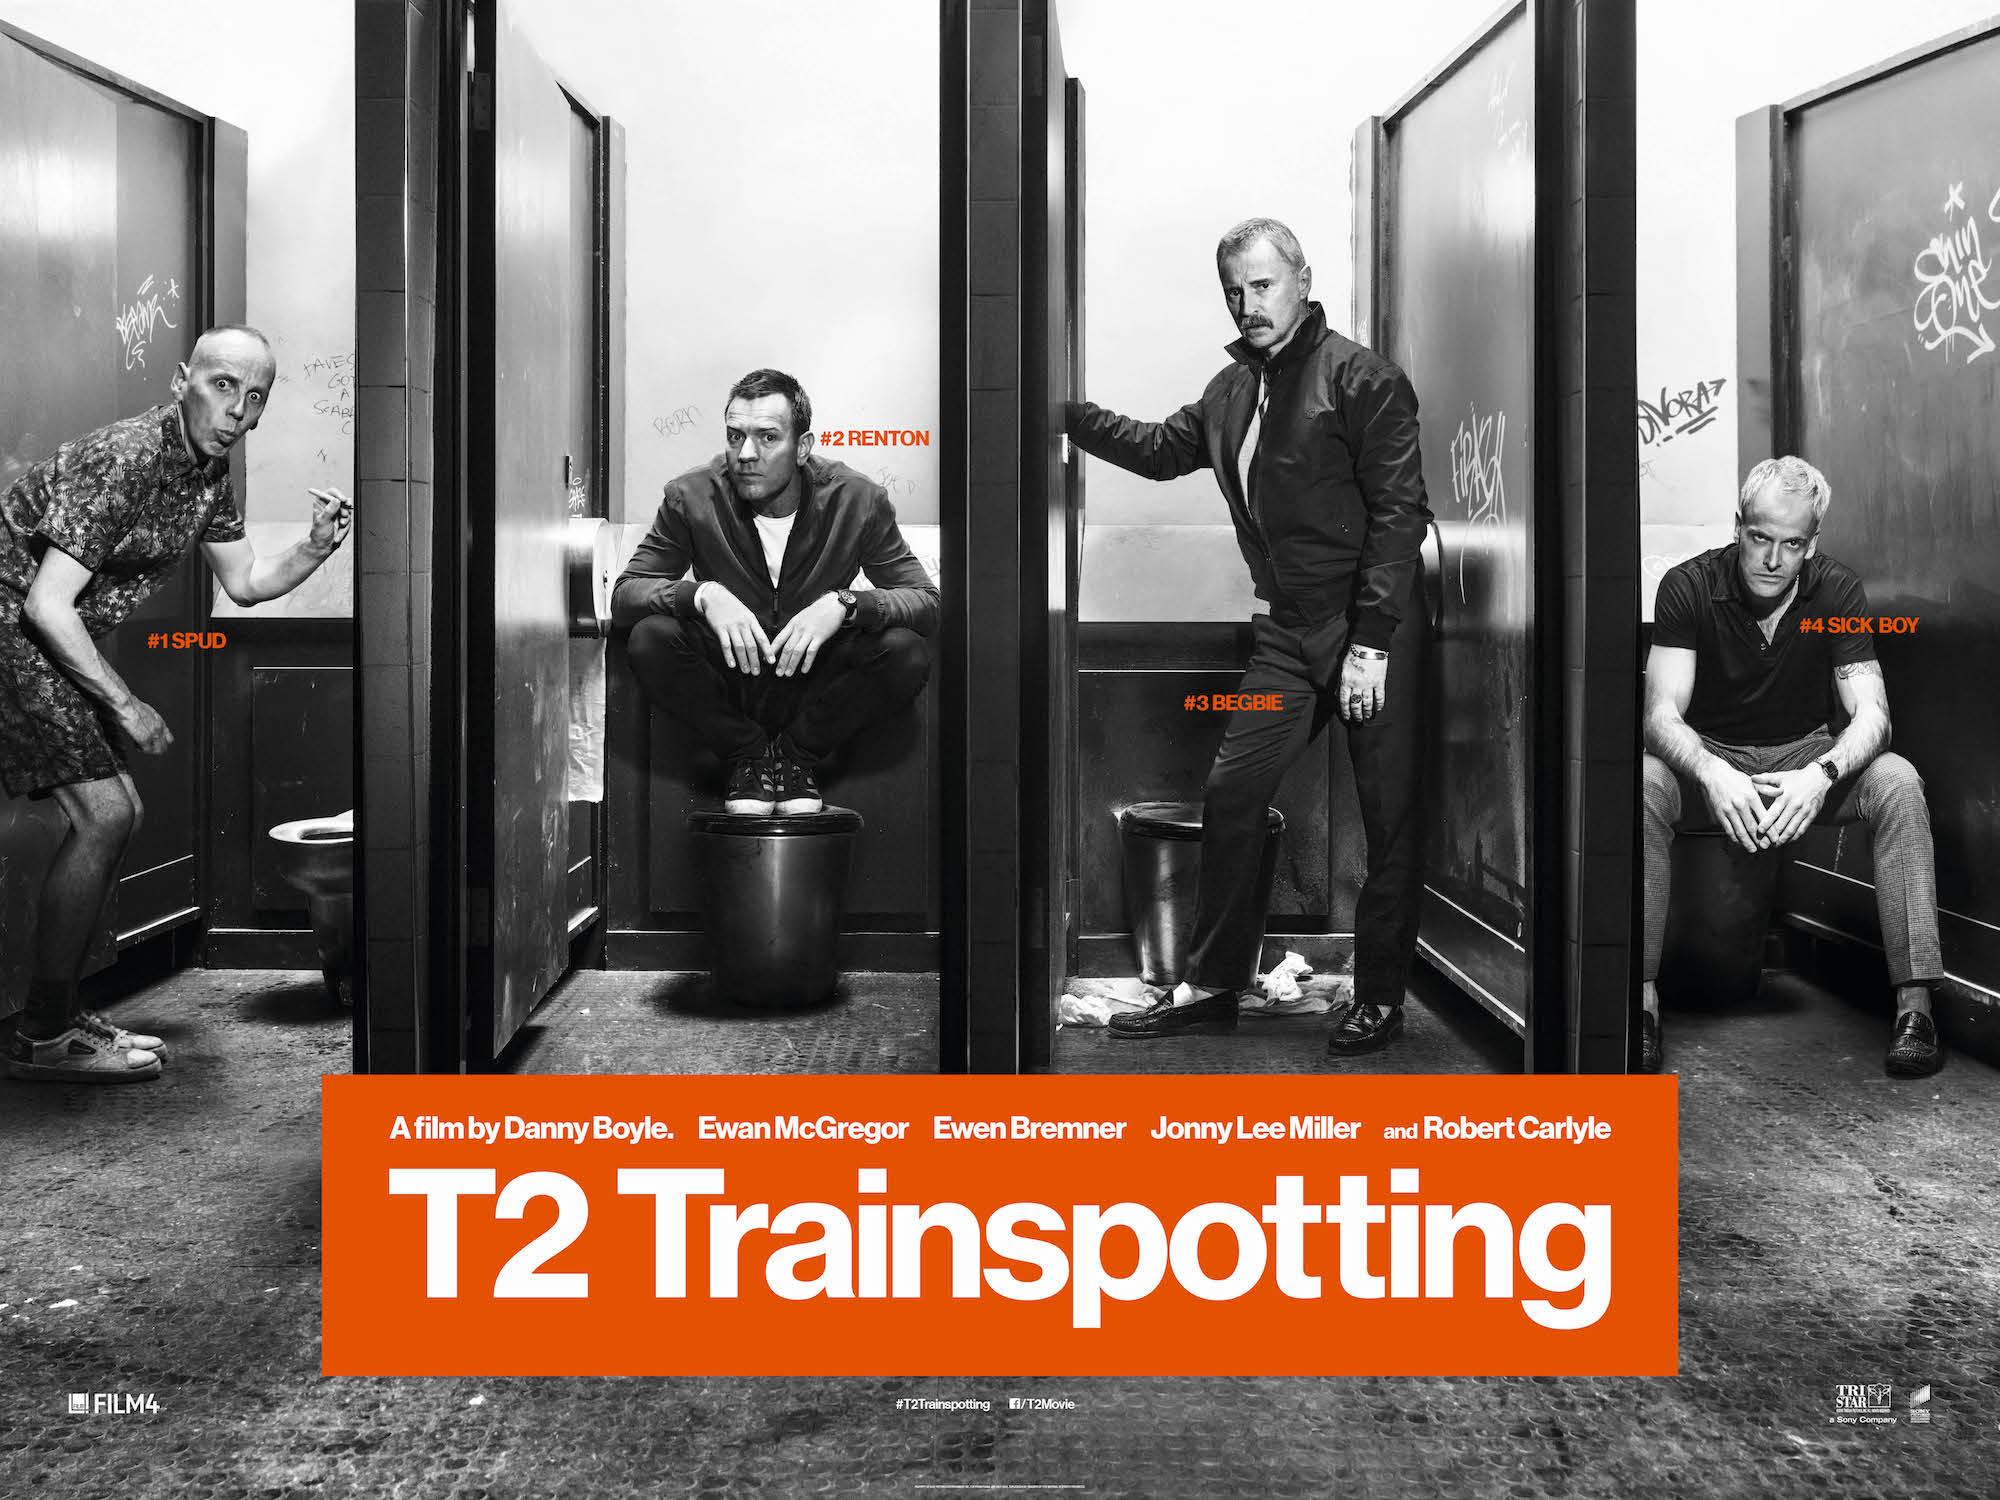 T2: Trainspotting muito além da super trilha sonora